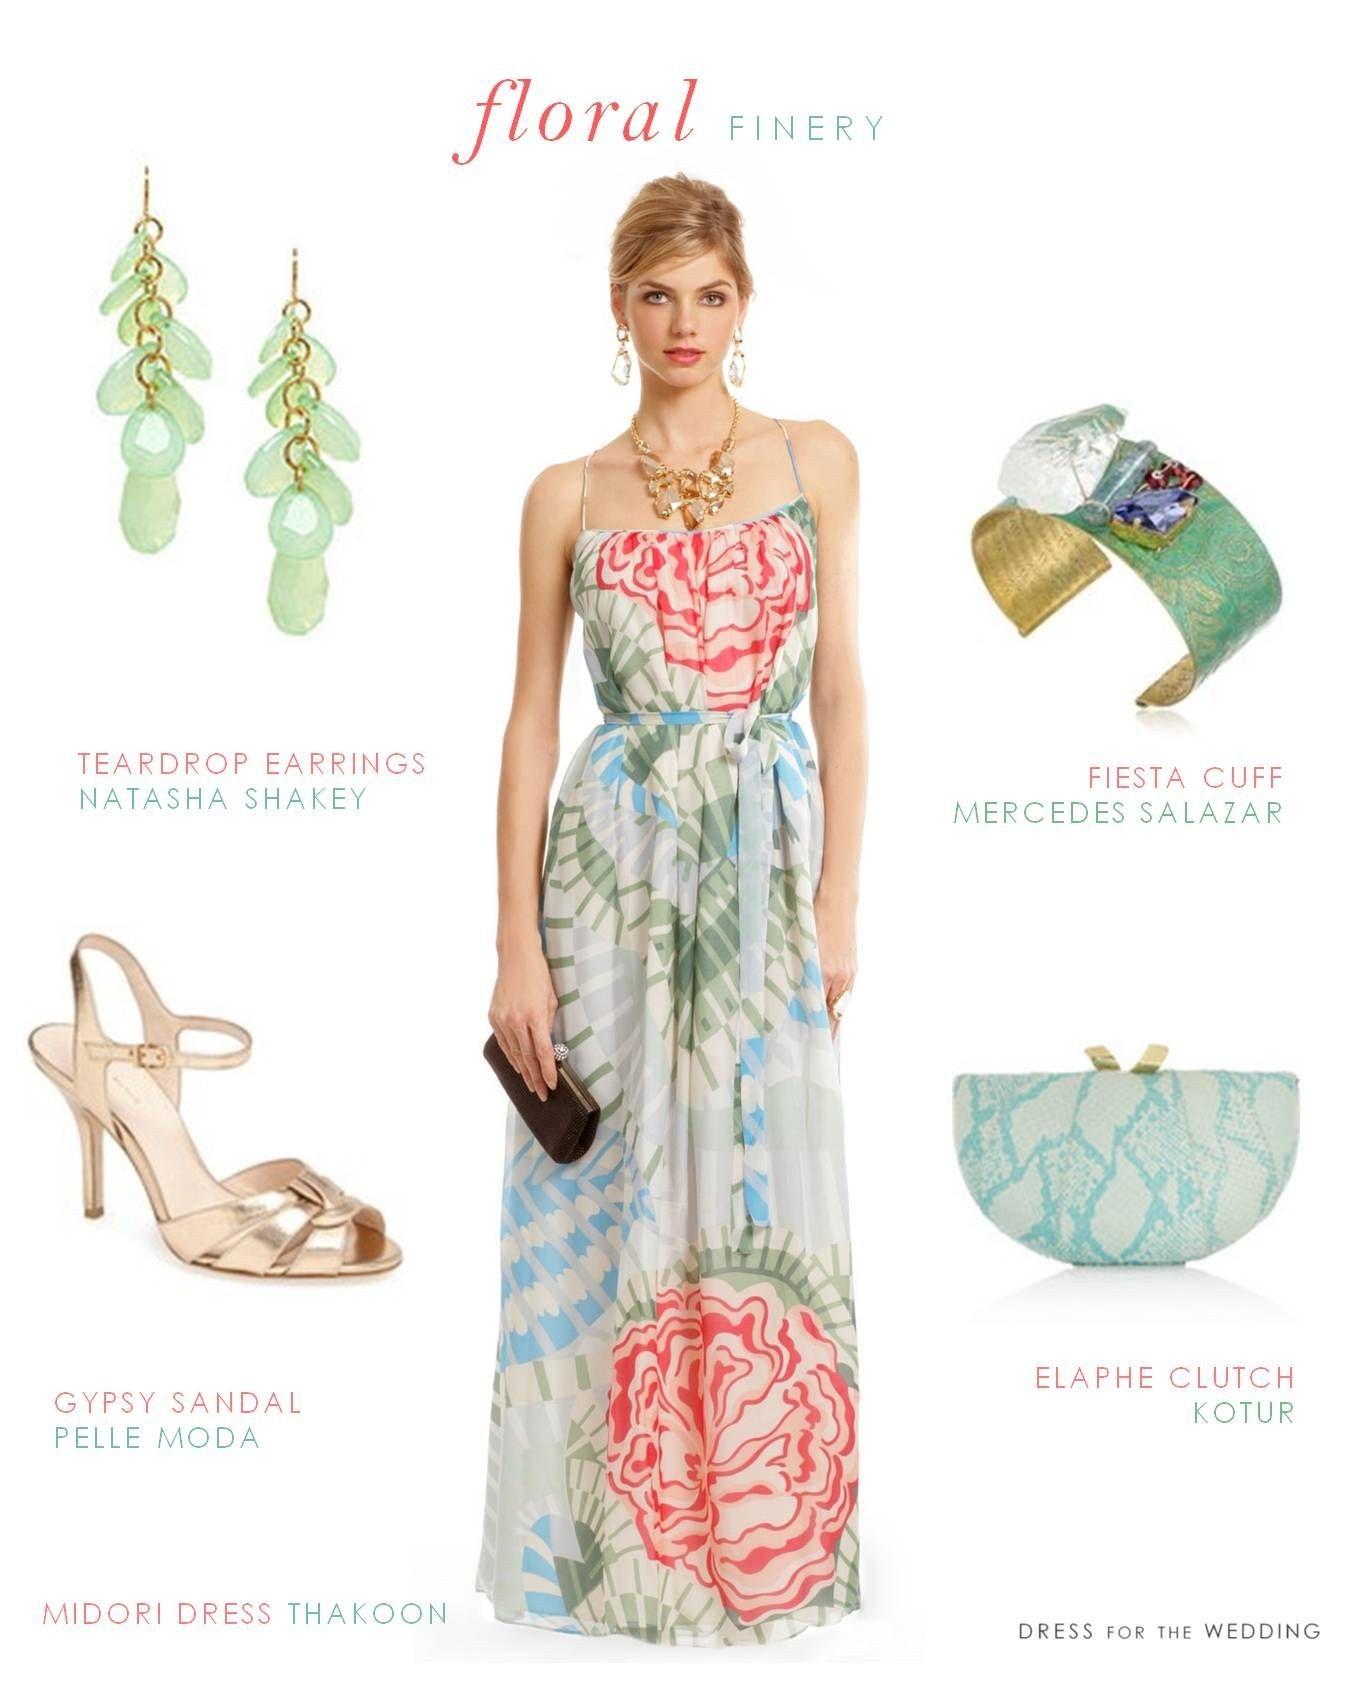 48 Luxury Dresses For Beach Wedding Guest Graphics Wedding Dress Gallery Beach Wedding Guest Dress Beach Wedding Outfit Guest Beach Wedding Outfit [ 1689 x 1365 Pixel ]